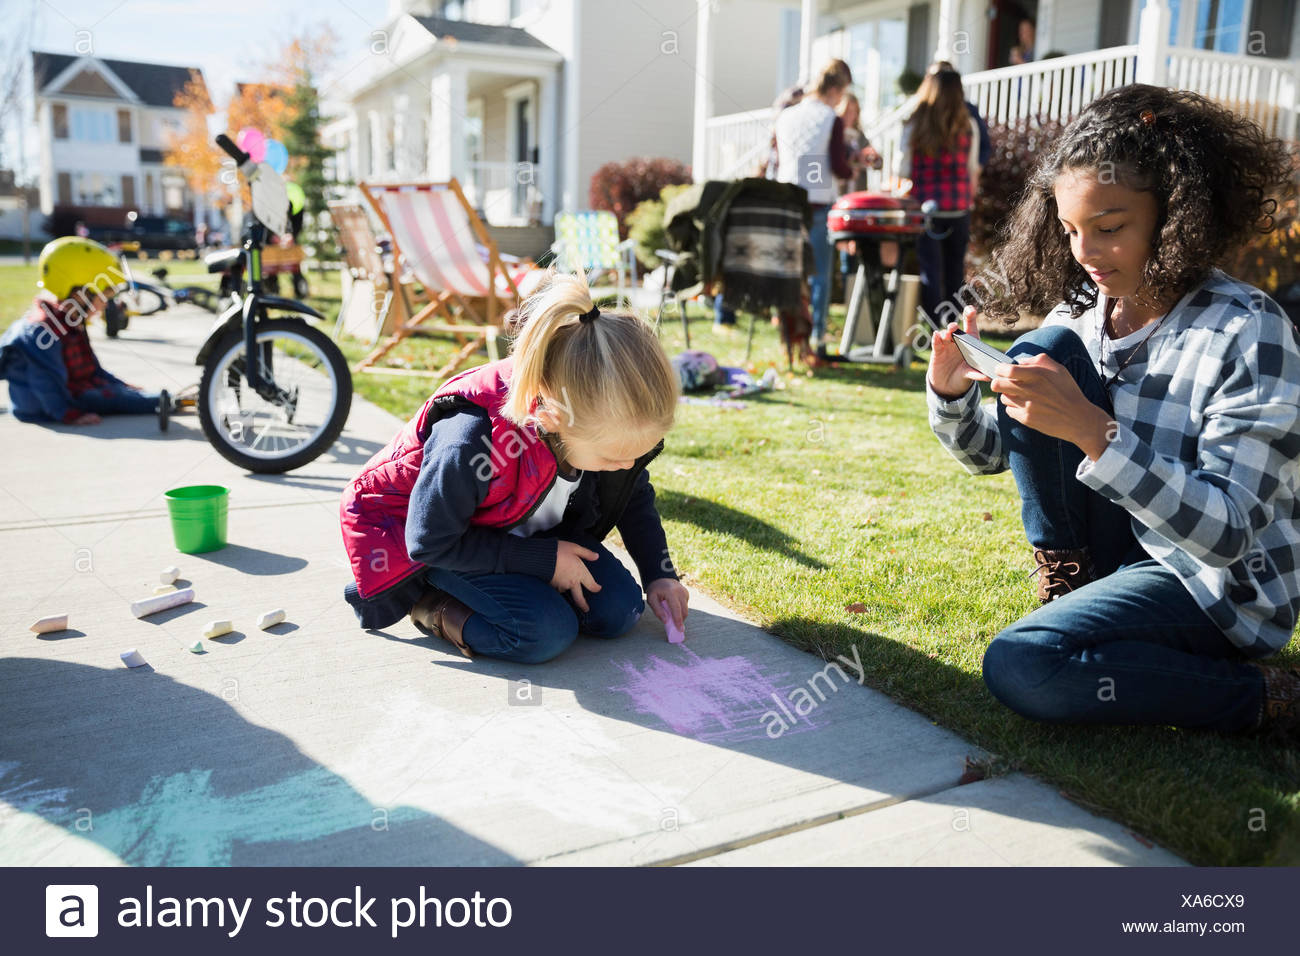 Kids drawing on sidewalk with chalk Stock Photo